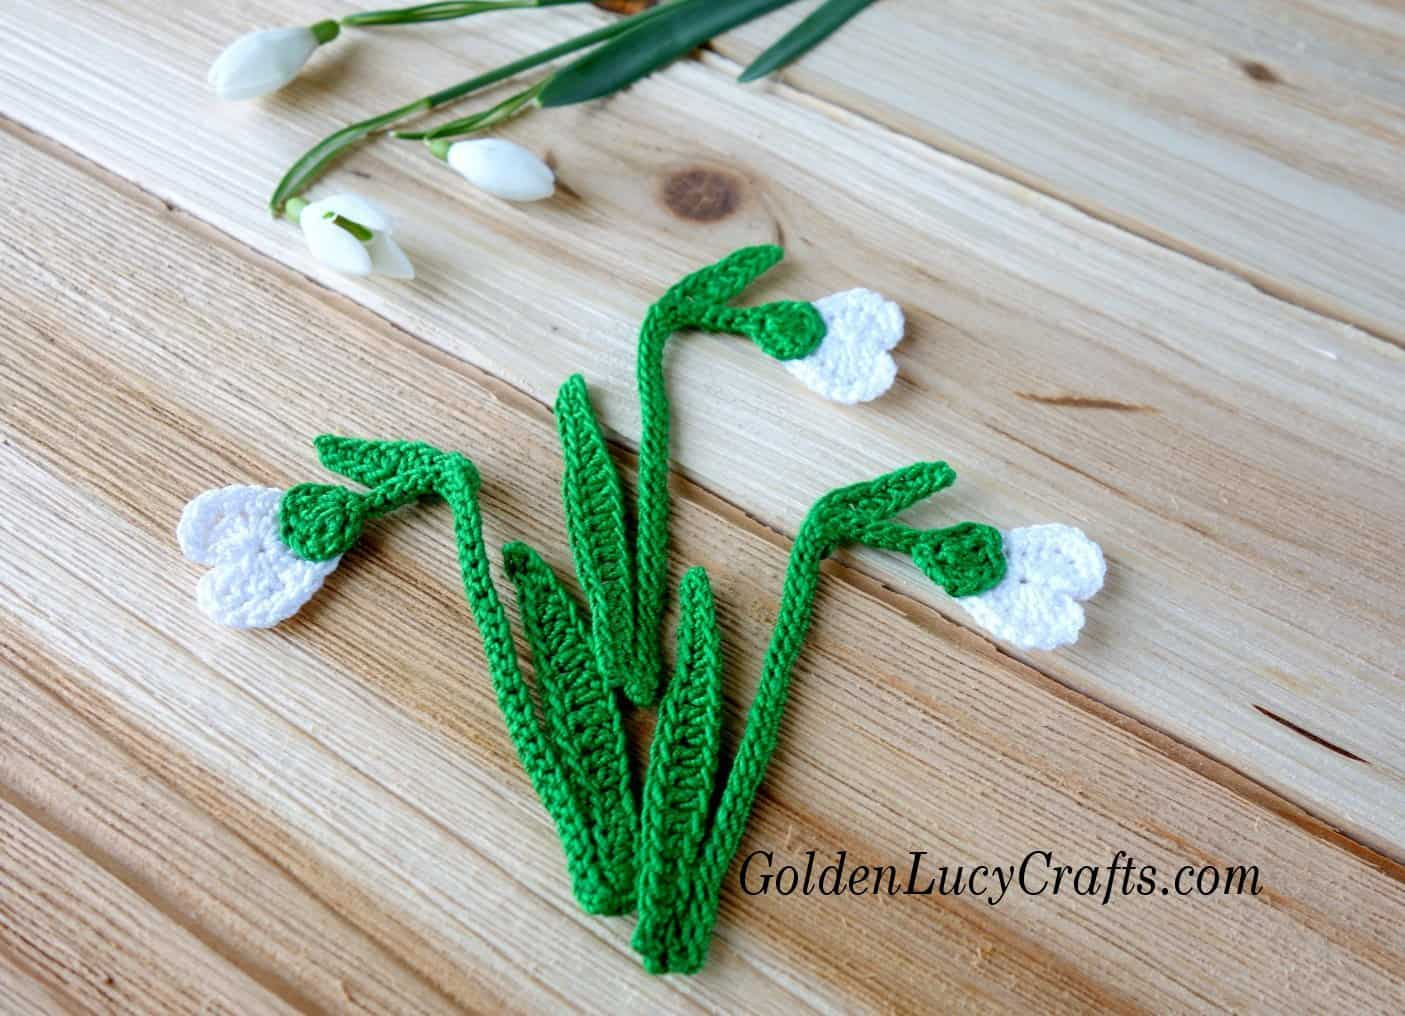 Crochet Snowdrop Flower Free Crochet Pattern Goldenlucycrafts